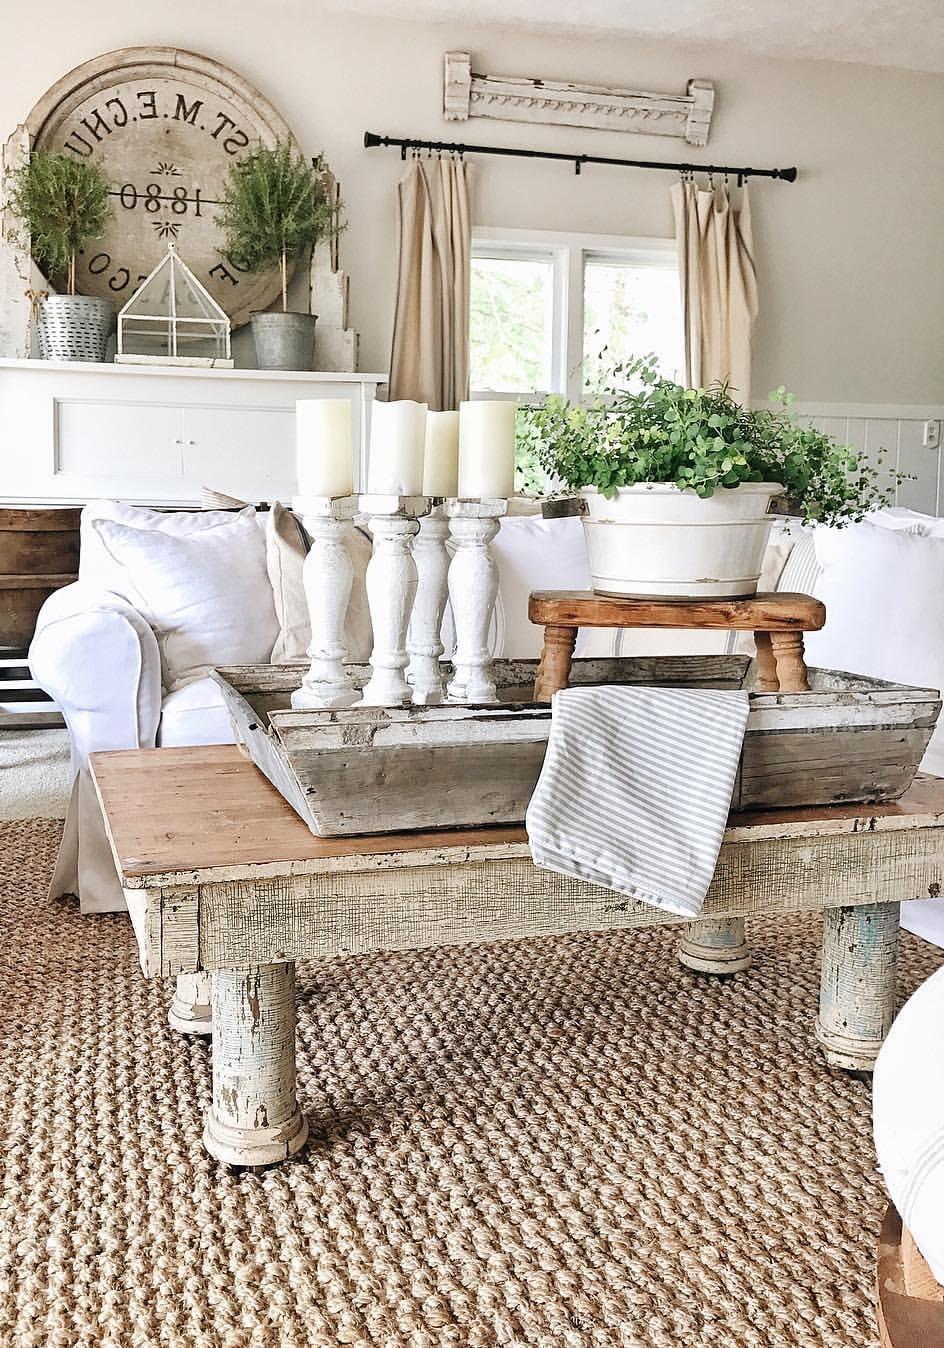 11 Best Dining Room Table Decor Ideas